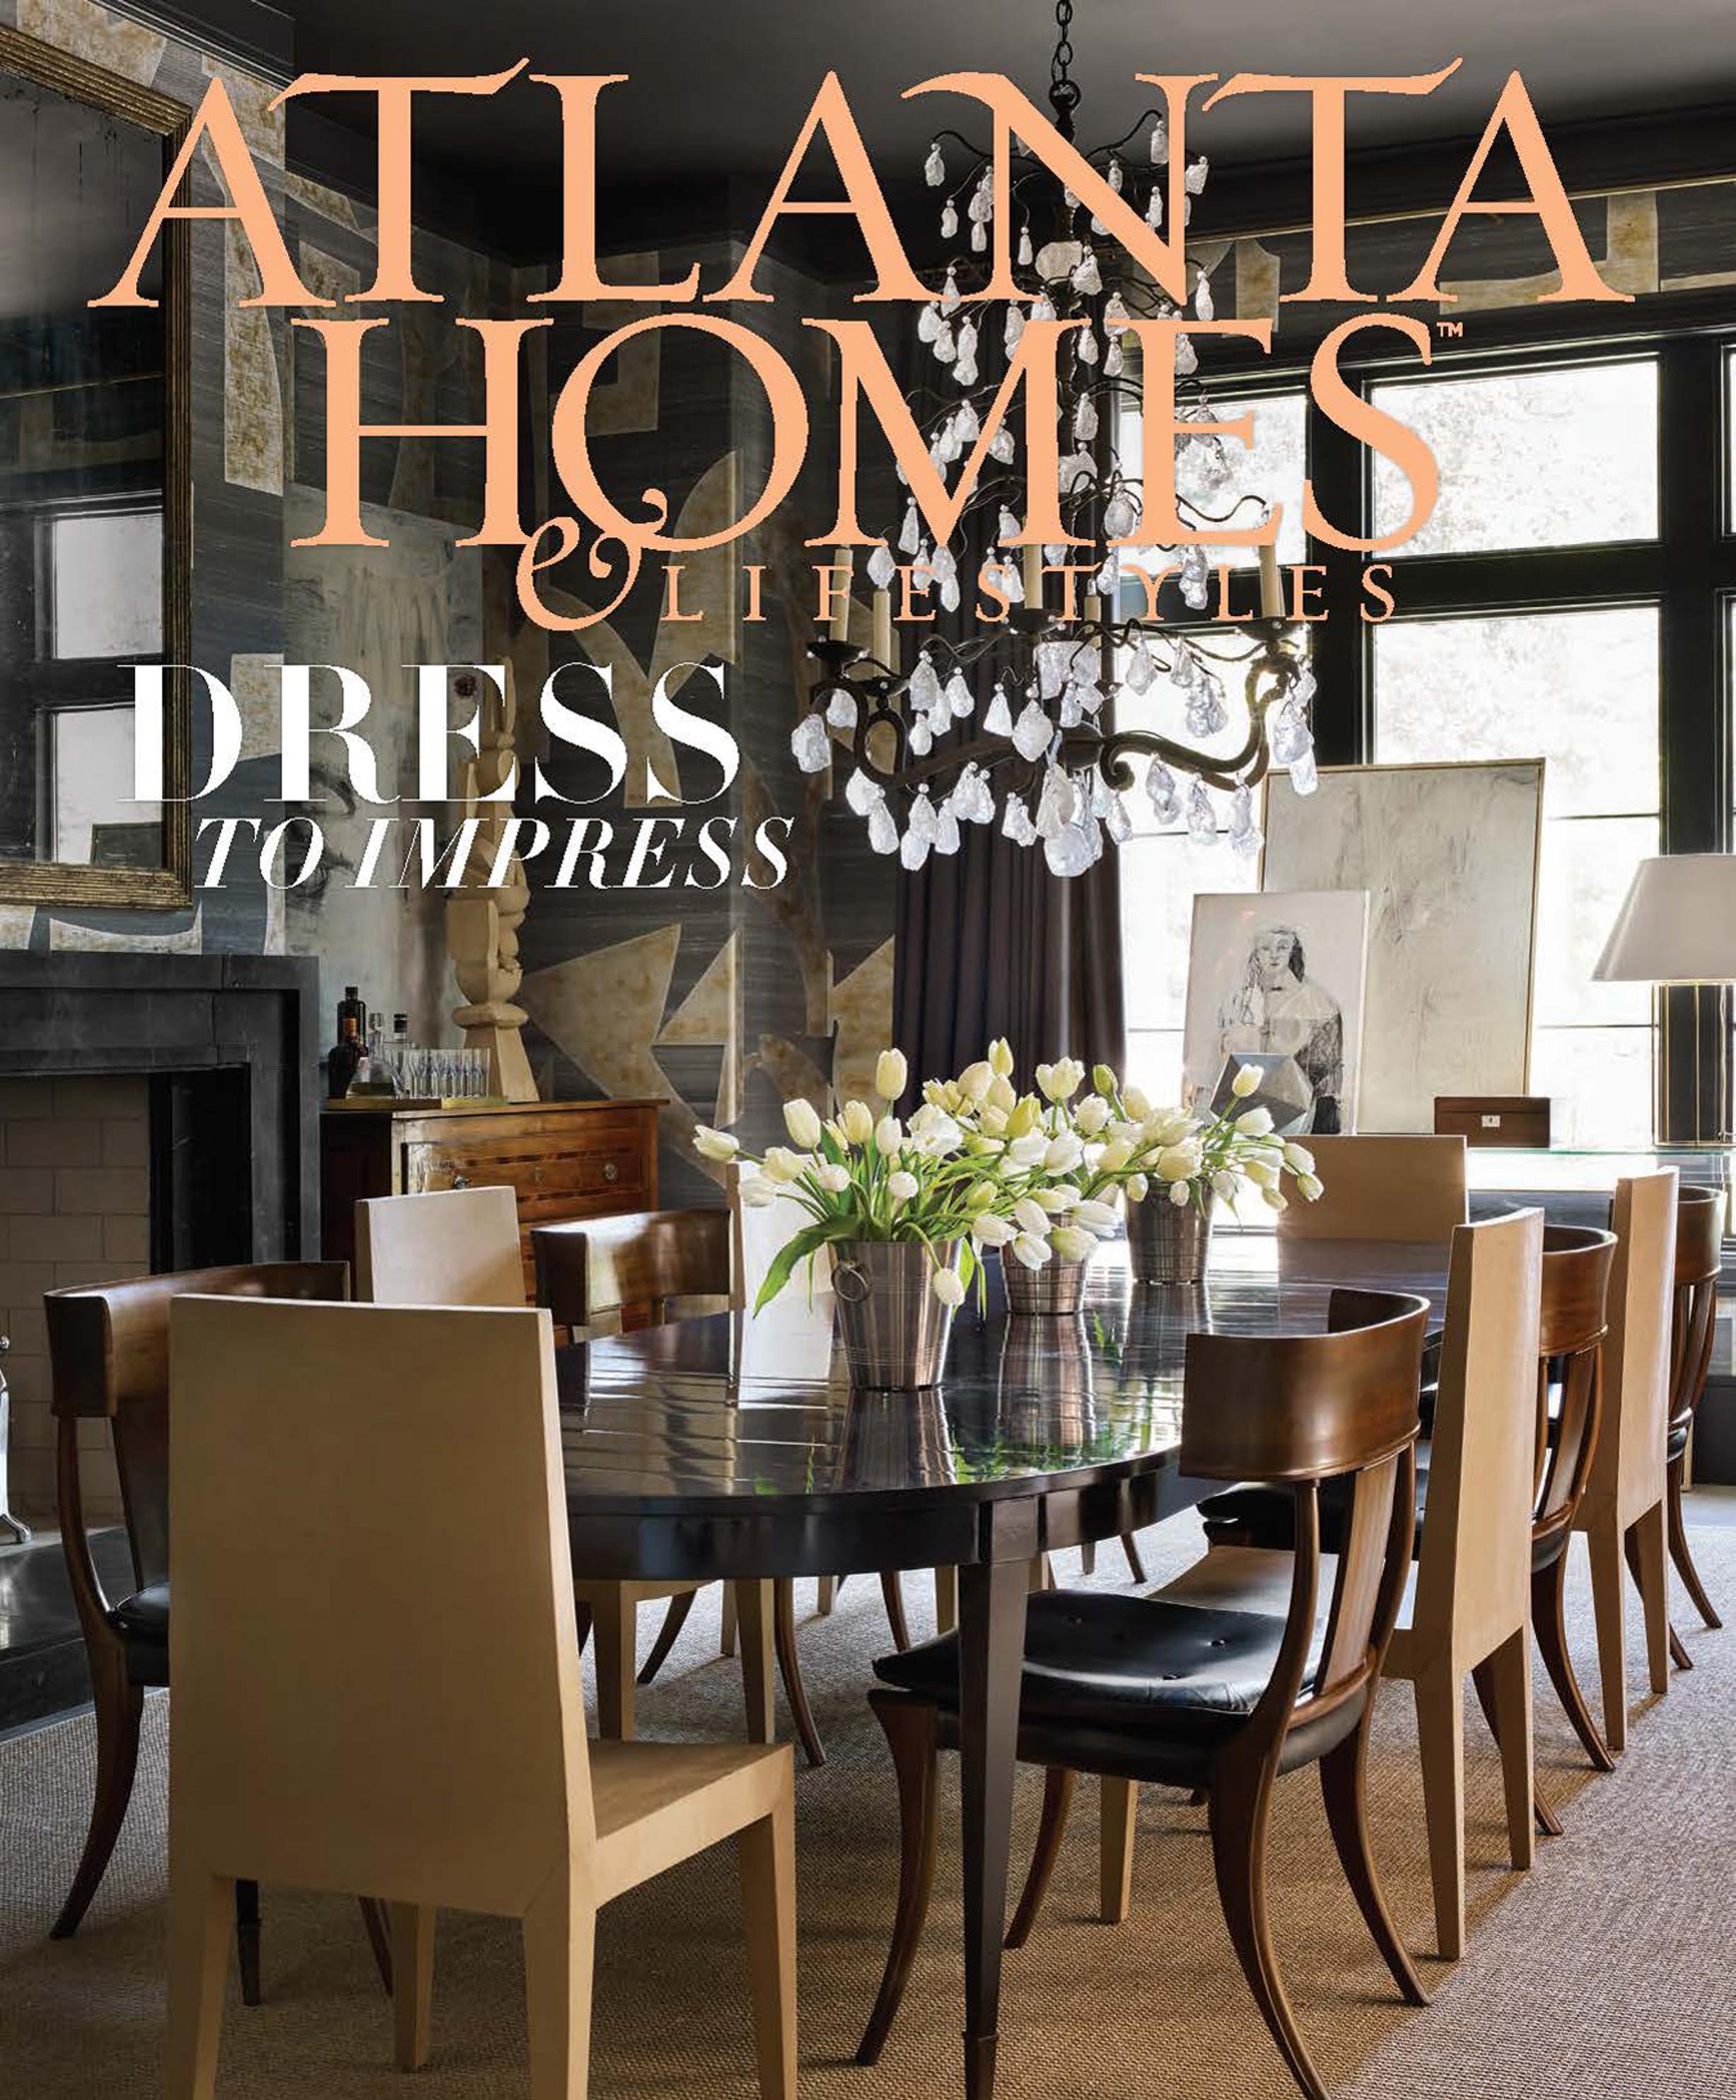 Atlanta Homes & Lifestyles September 2019